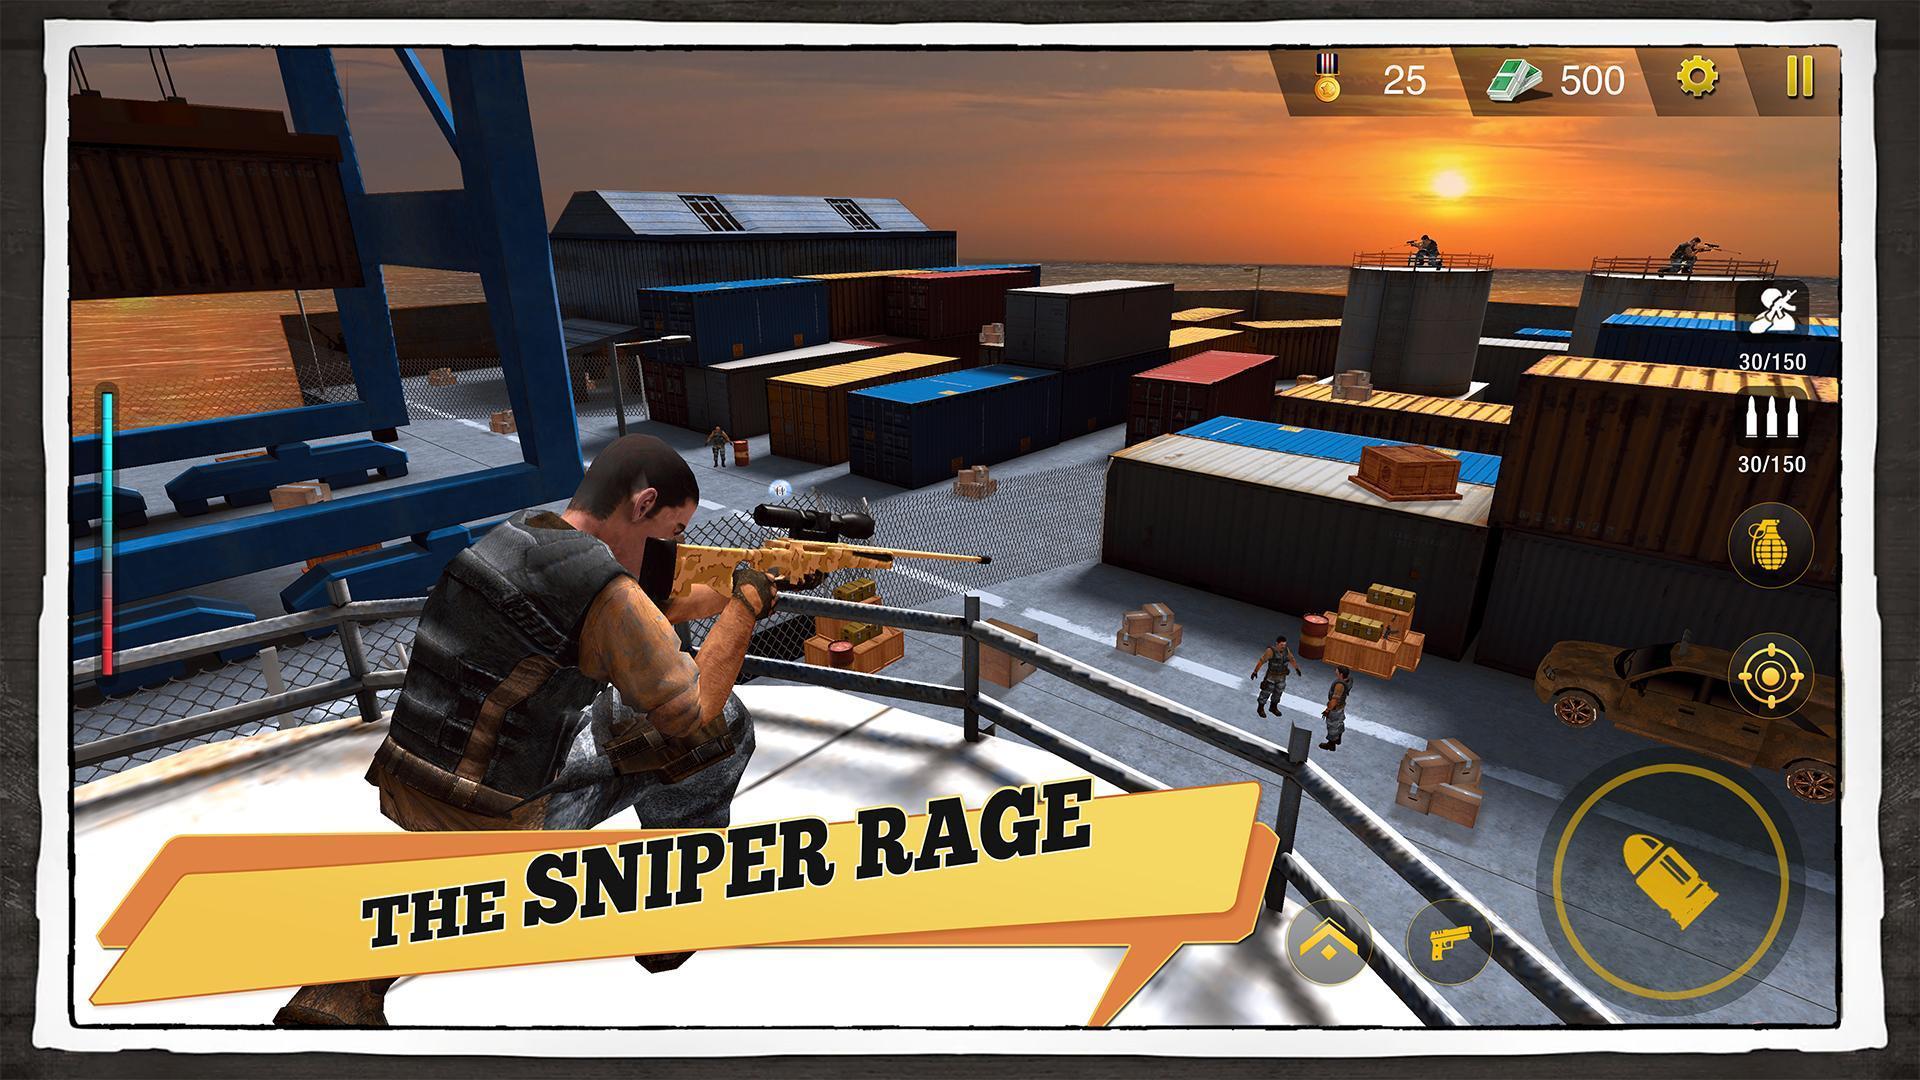 Yalghaar Delta IGI Commando Adventure Mobile Game 3.4 Screenshot 6